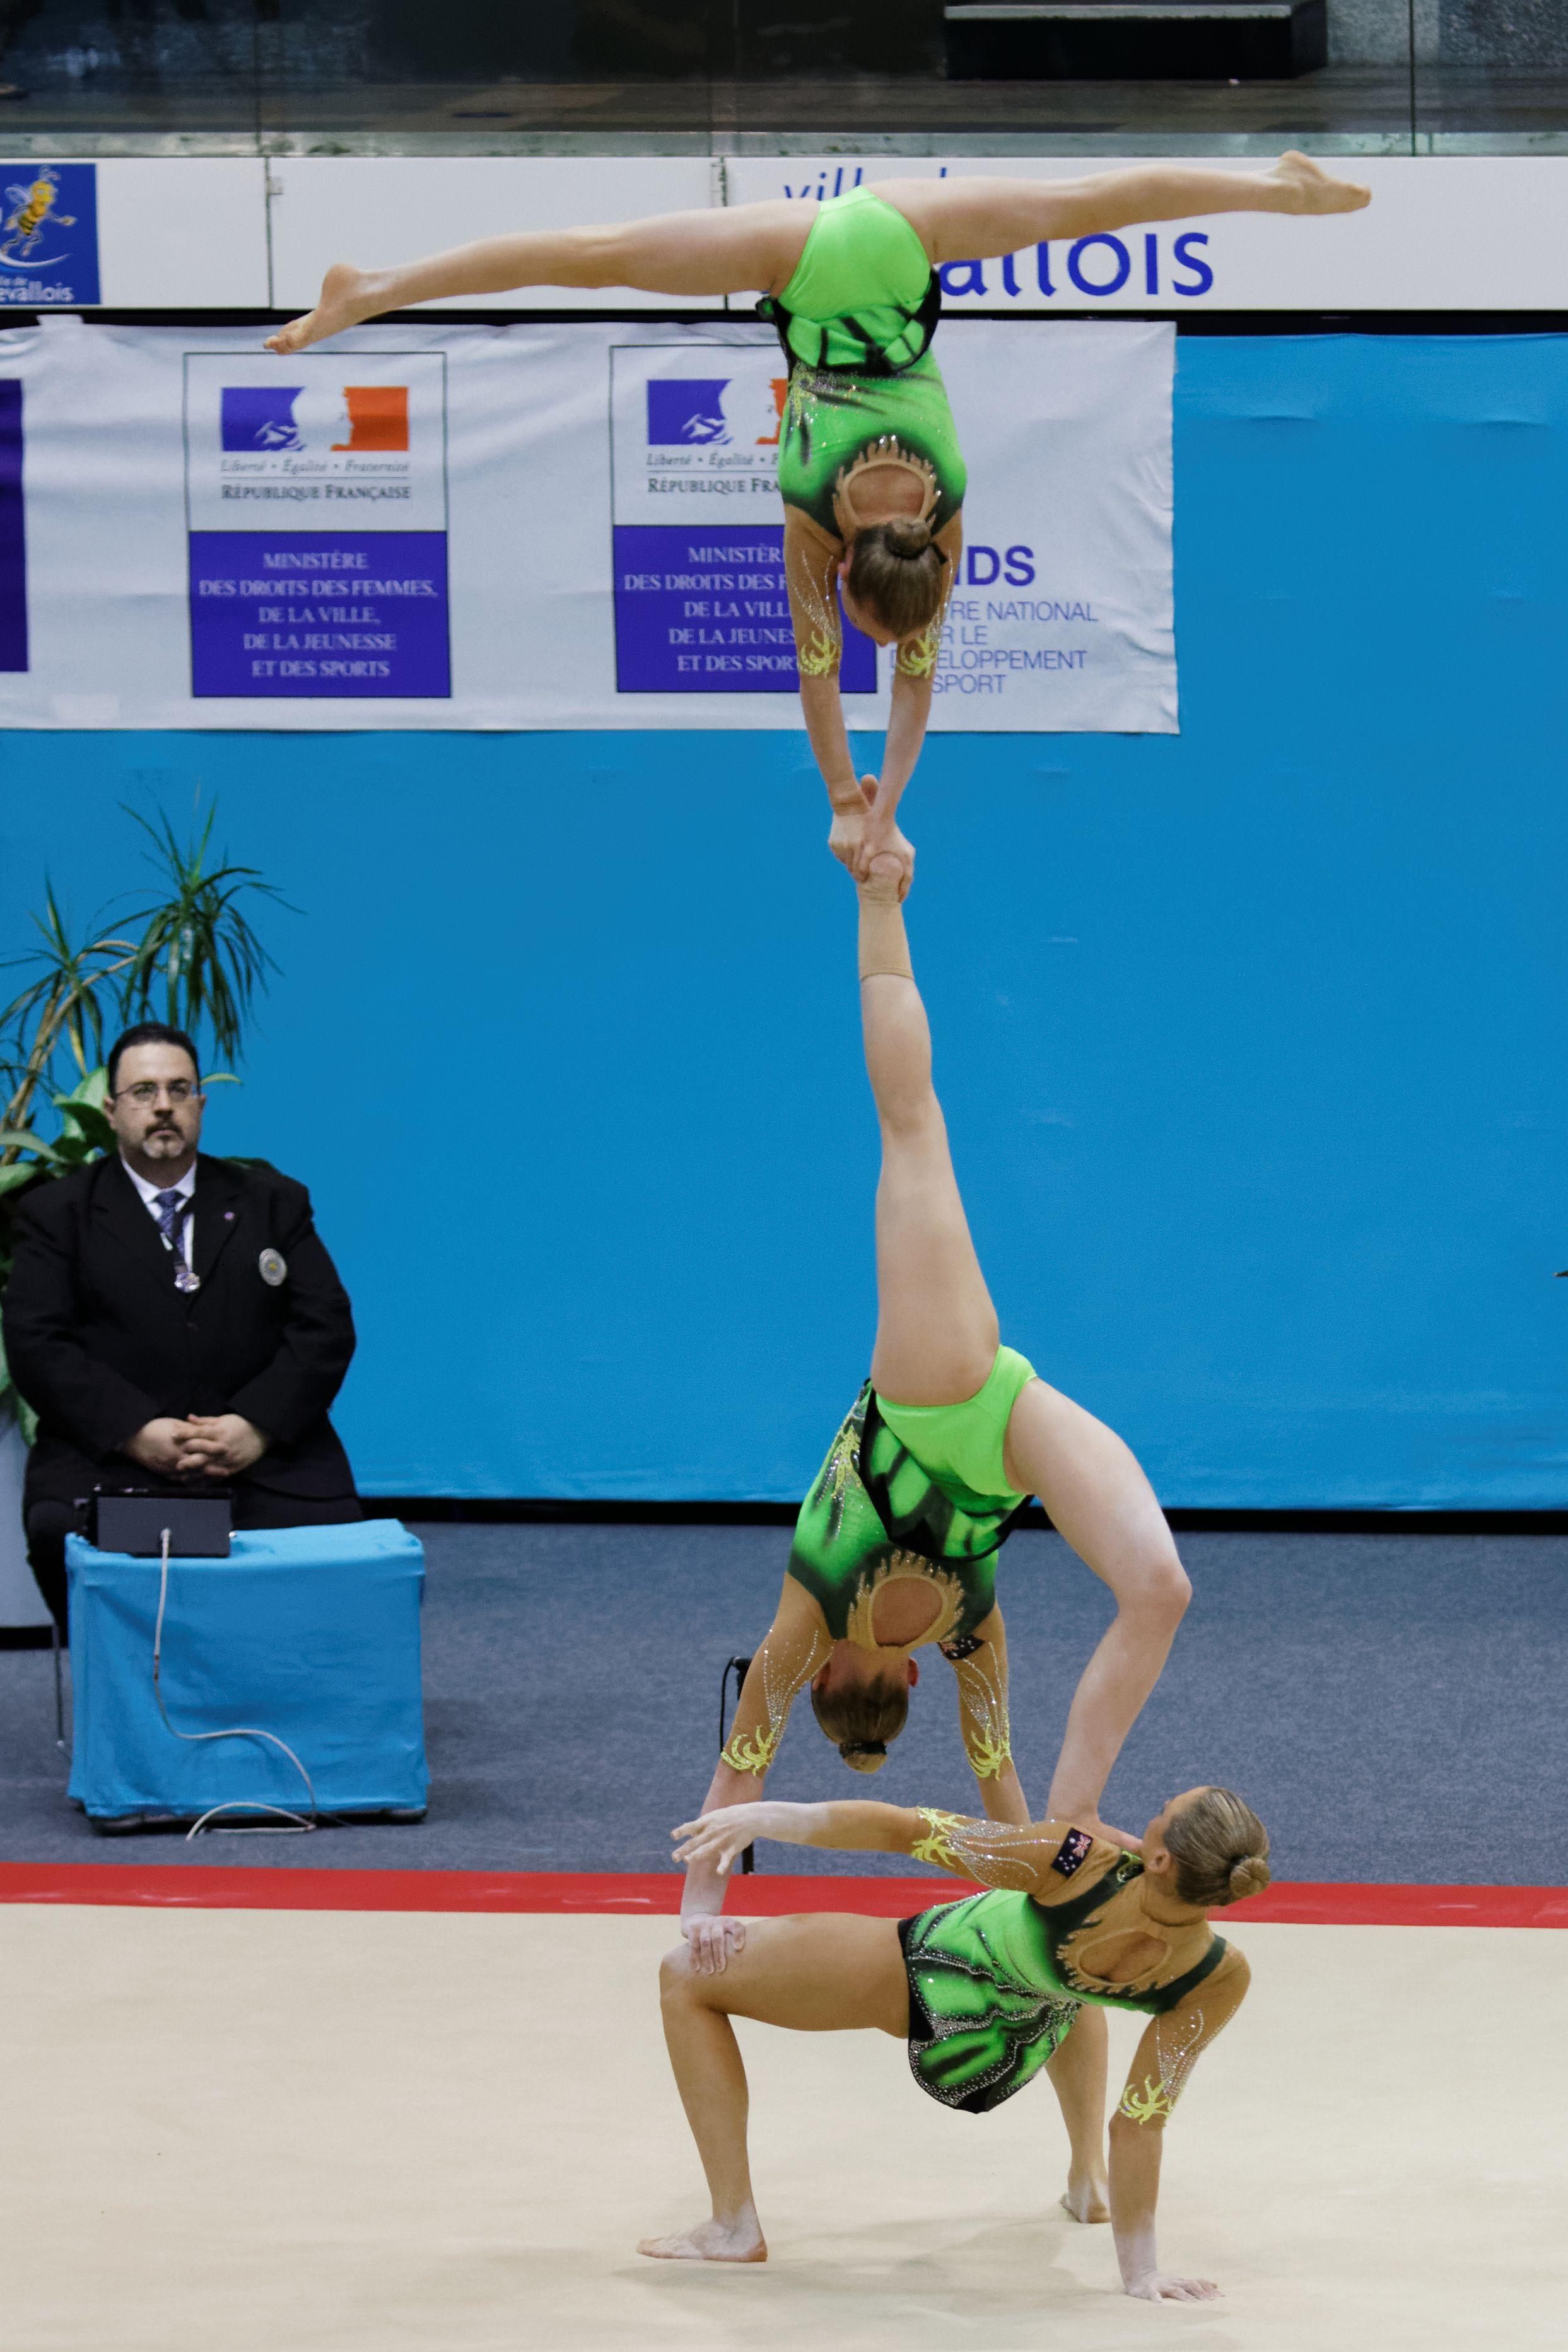 online gymnastics classes free